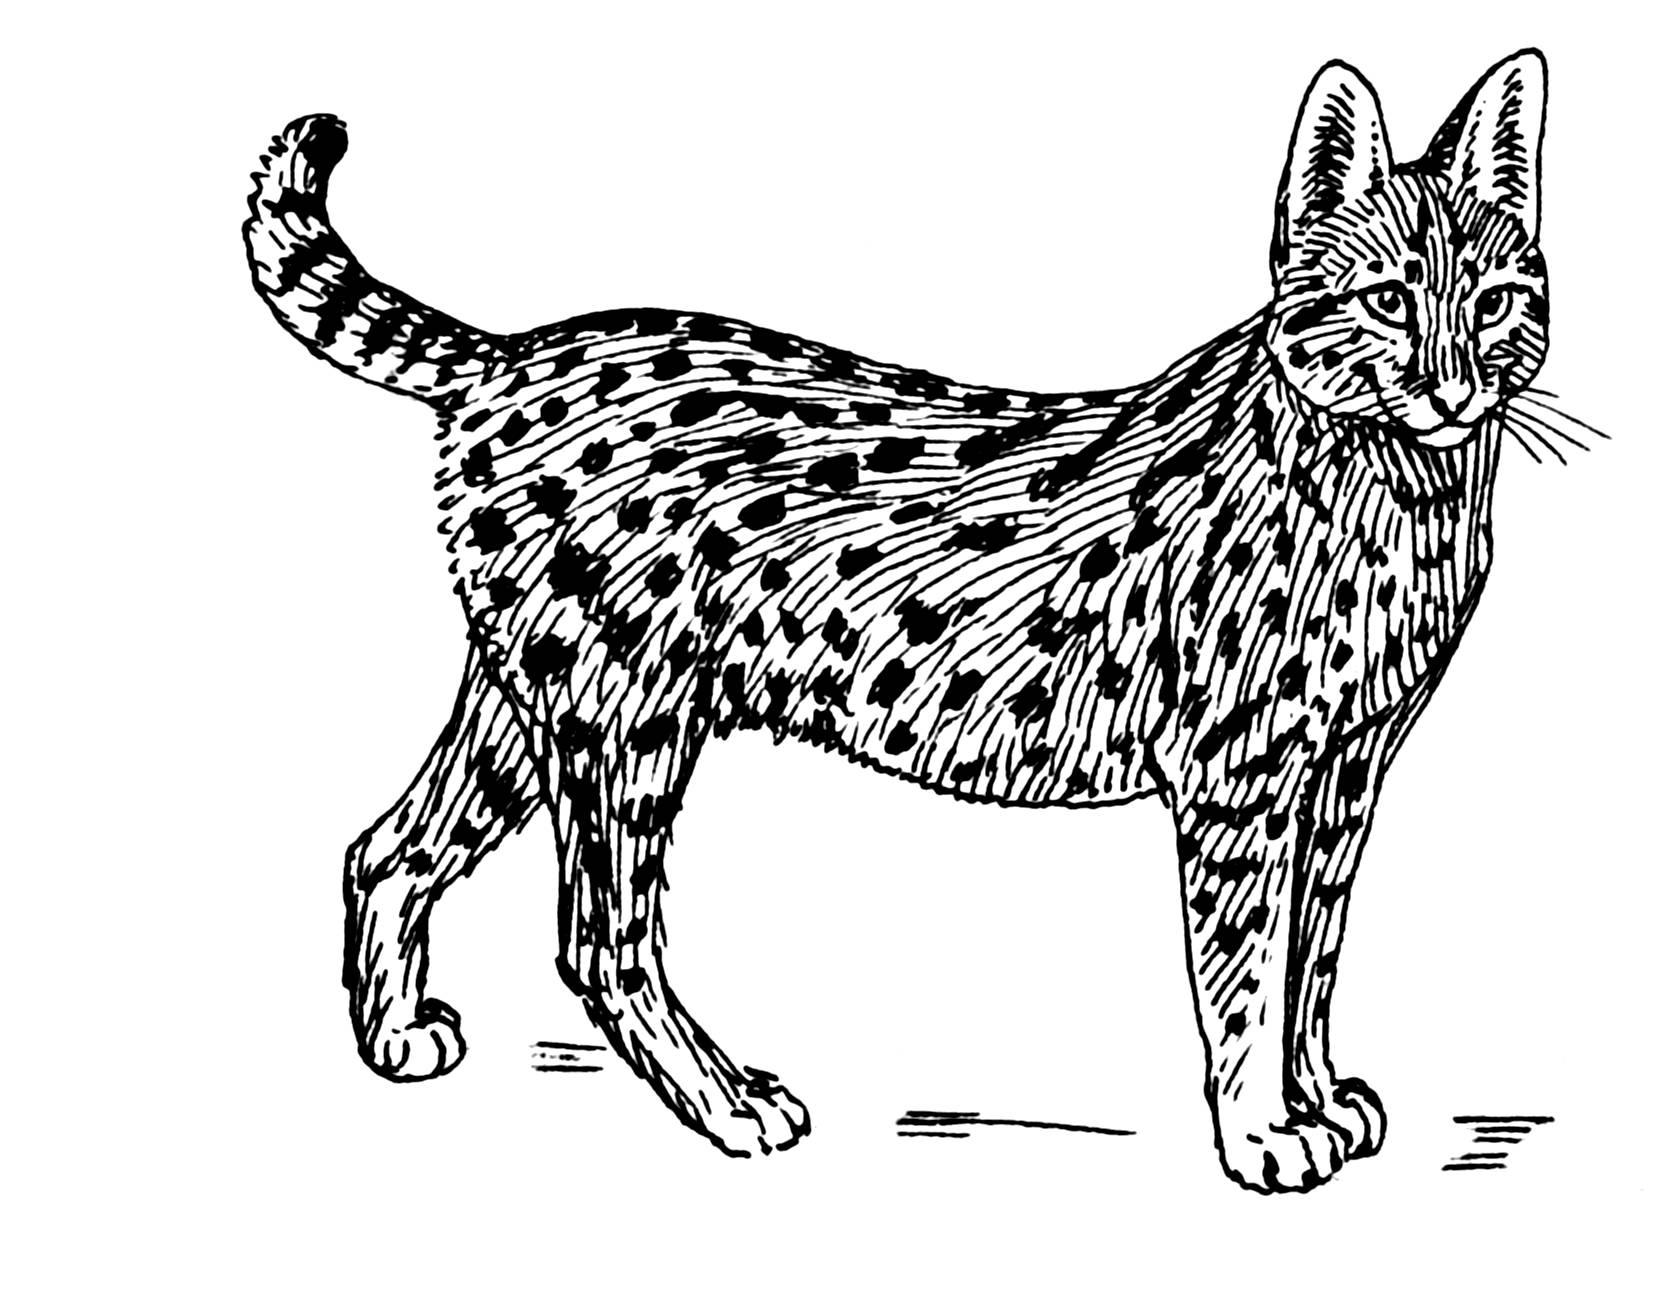 Small Amp Medium Cat Line Drawings For Coloring